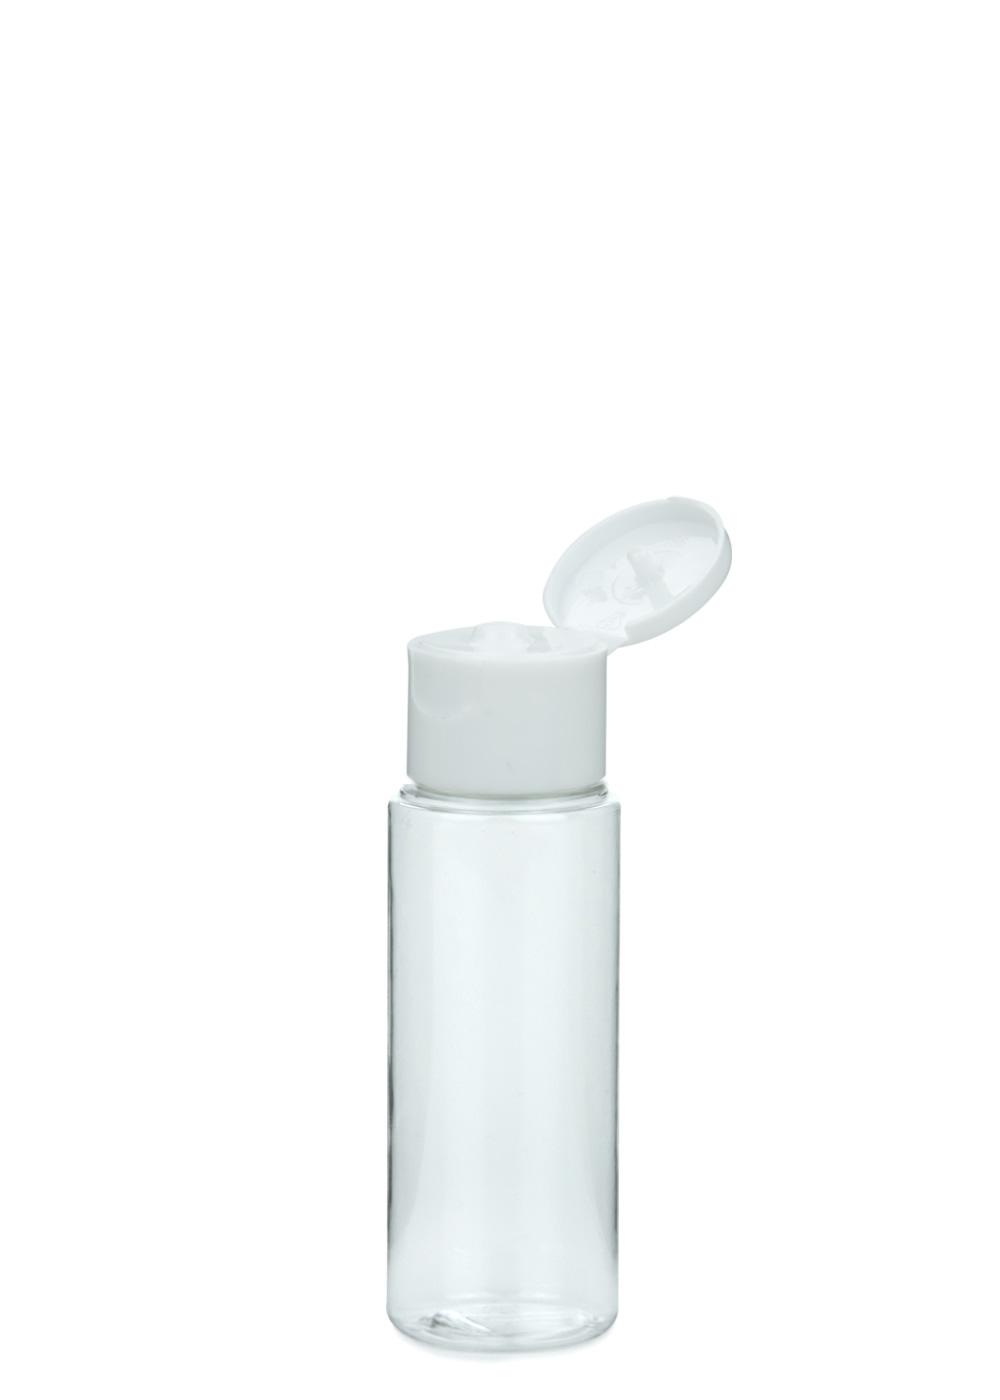 pet flasche leonora 50 ml klar mit klapp. Black Bedroom Furniture Sets. Home Design Ideas